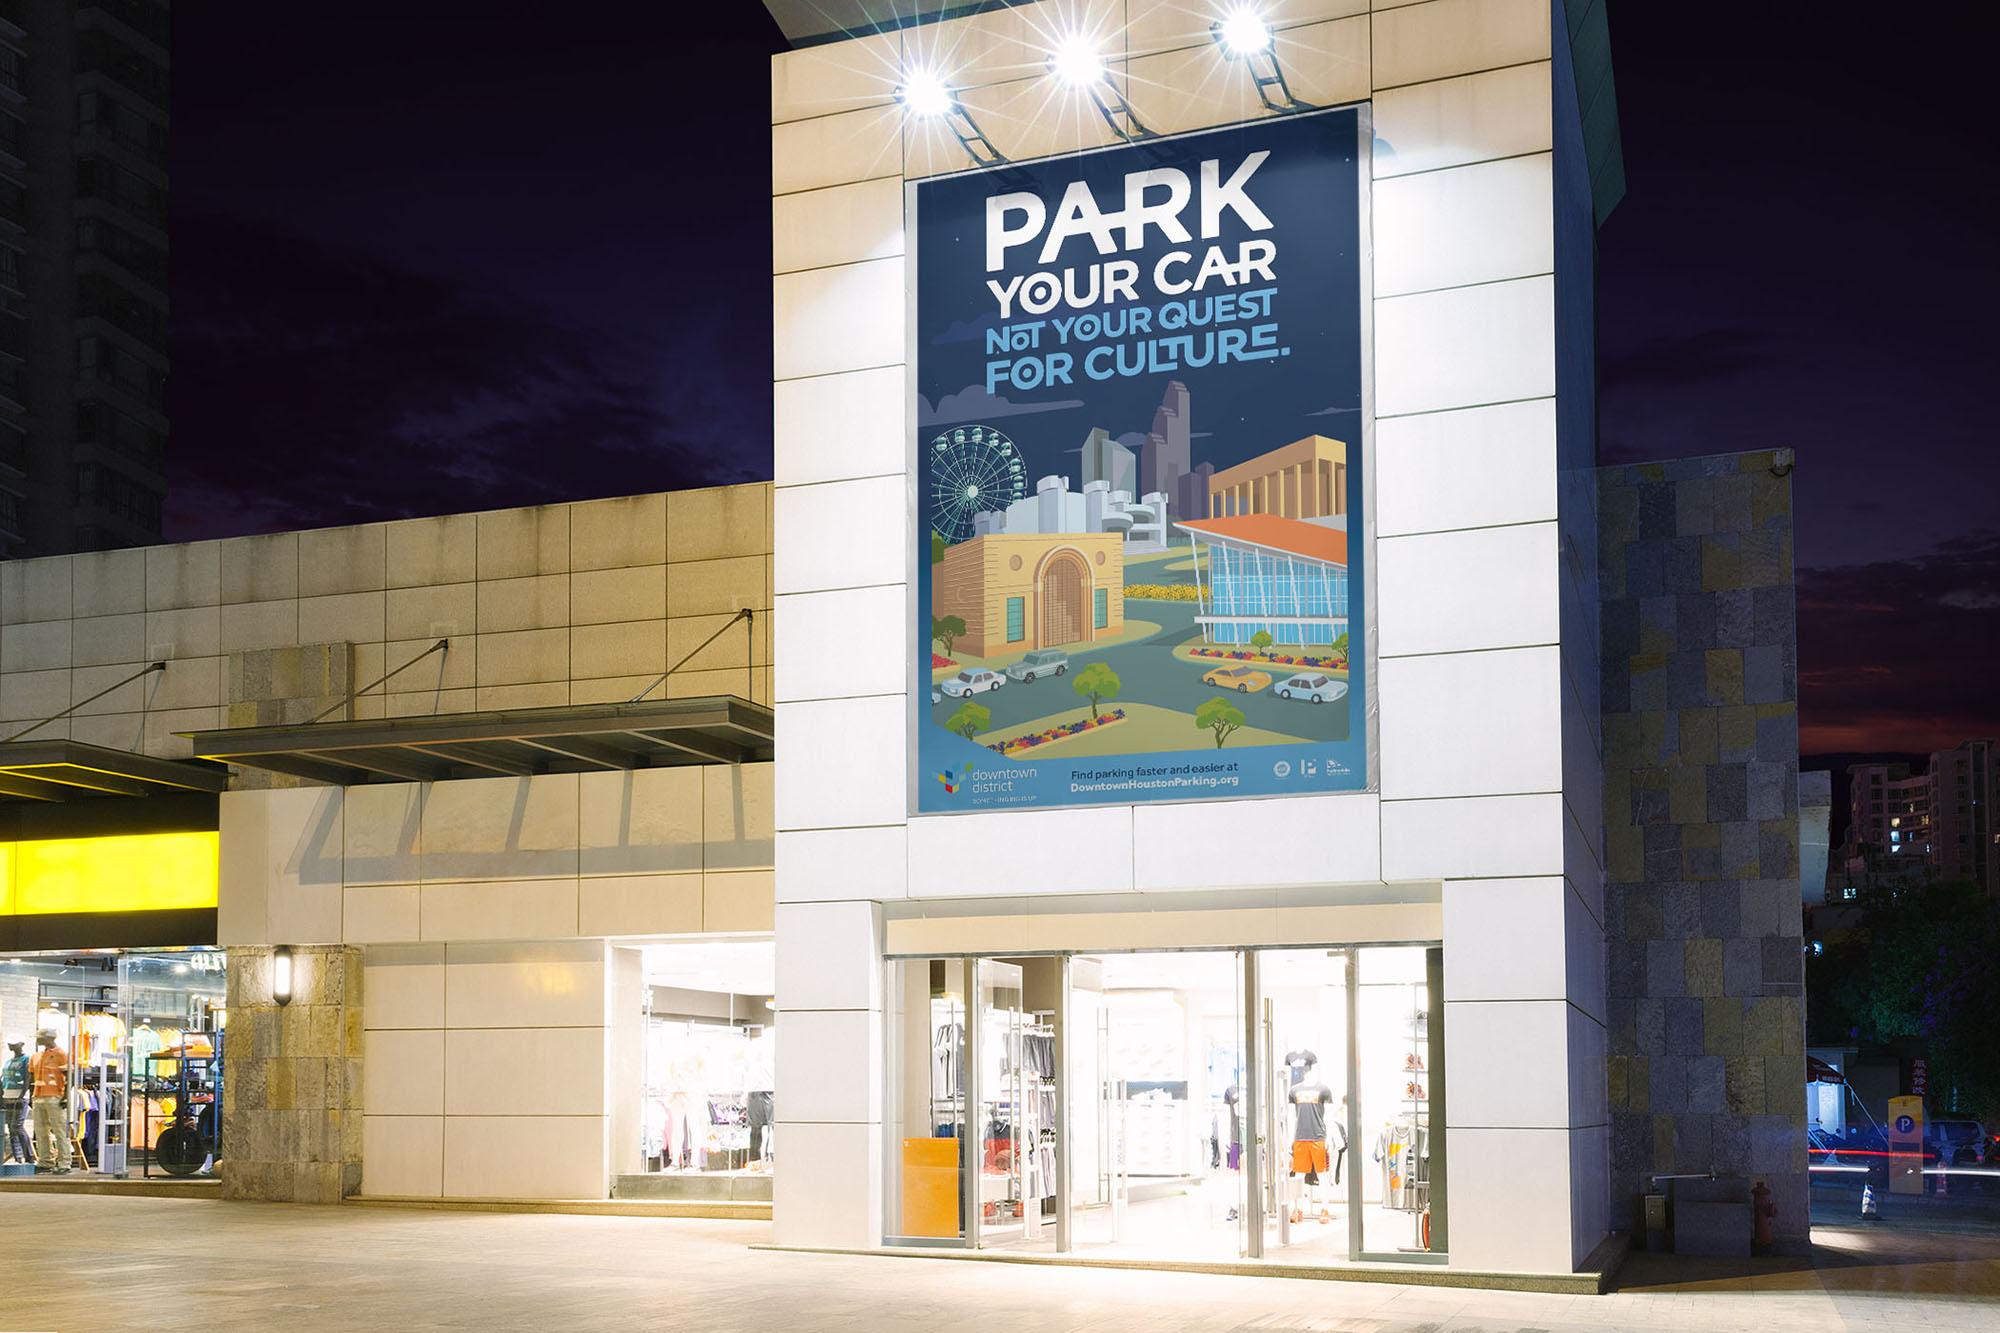 ParkingMockUp5.jpg